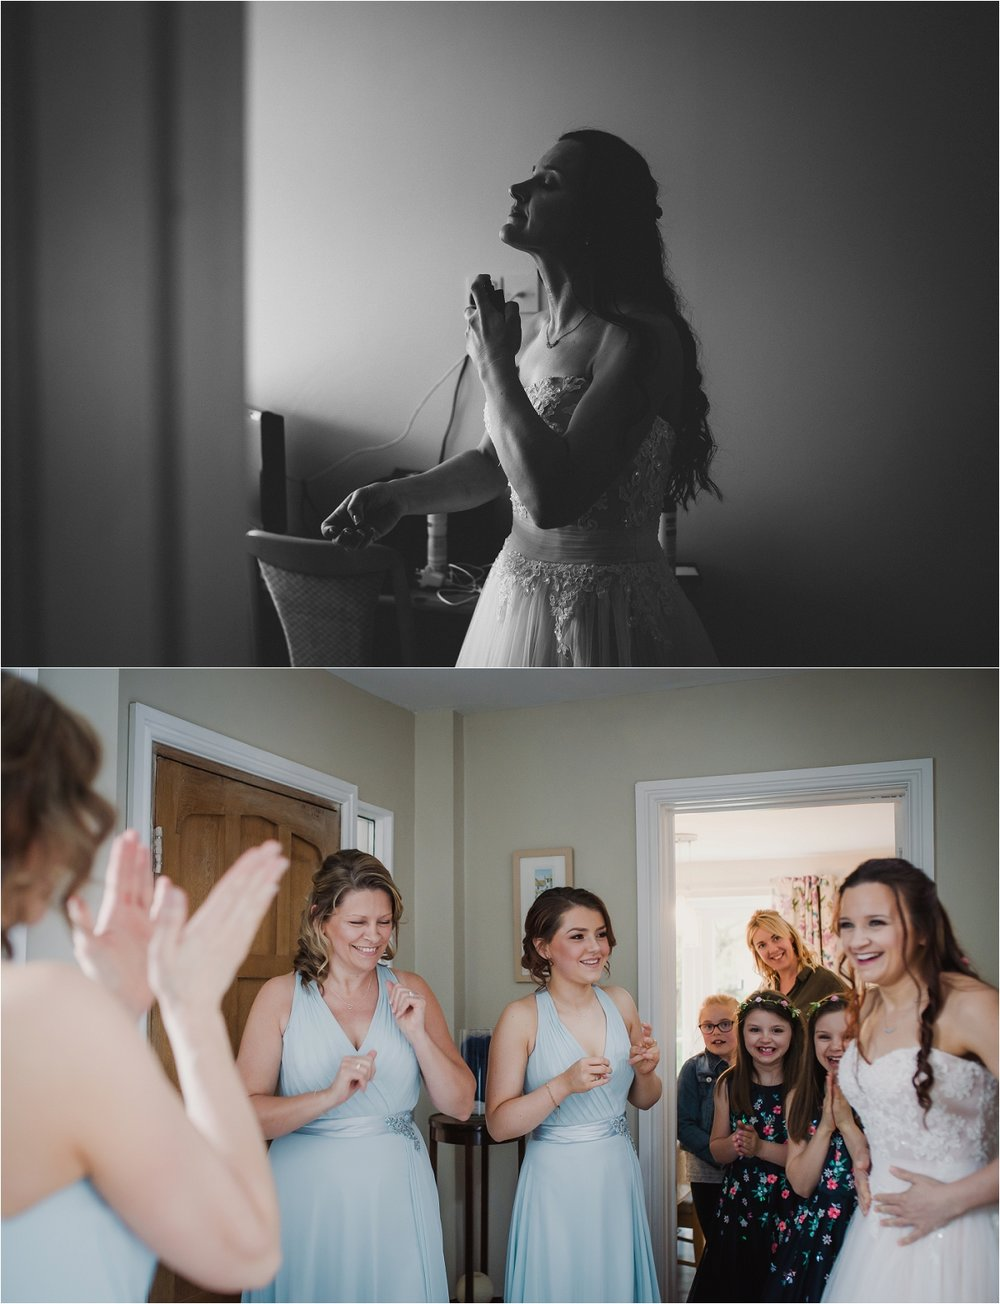 chris_emma_wedding_the_Fleece_inn_0017.jpg